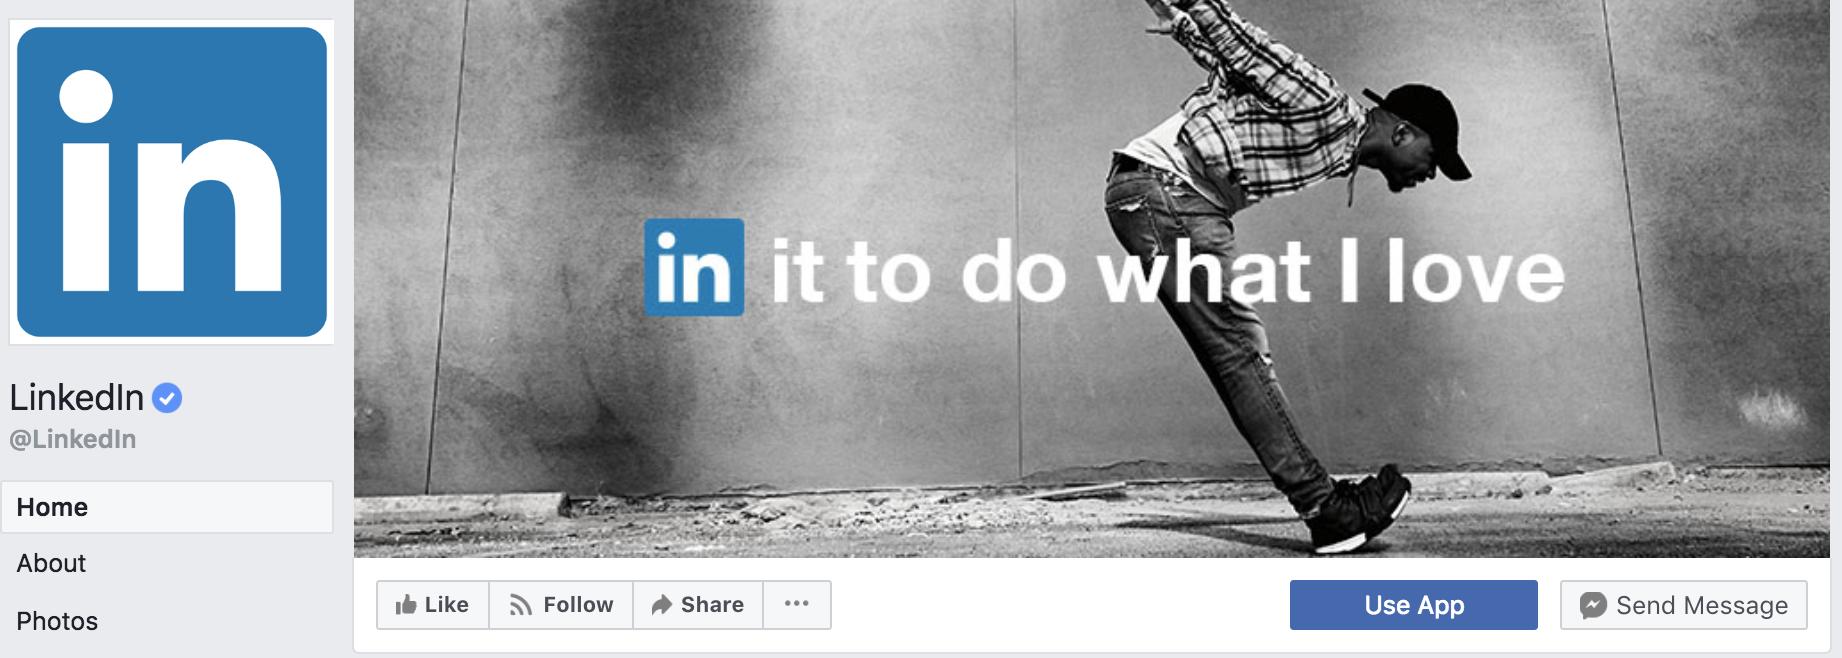 LinkedIn_Facebook cover photo